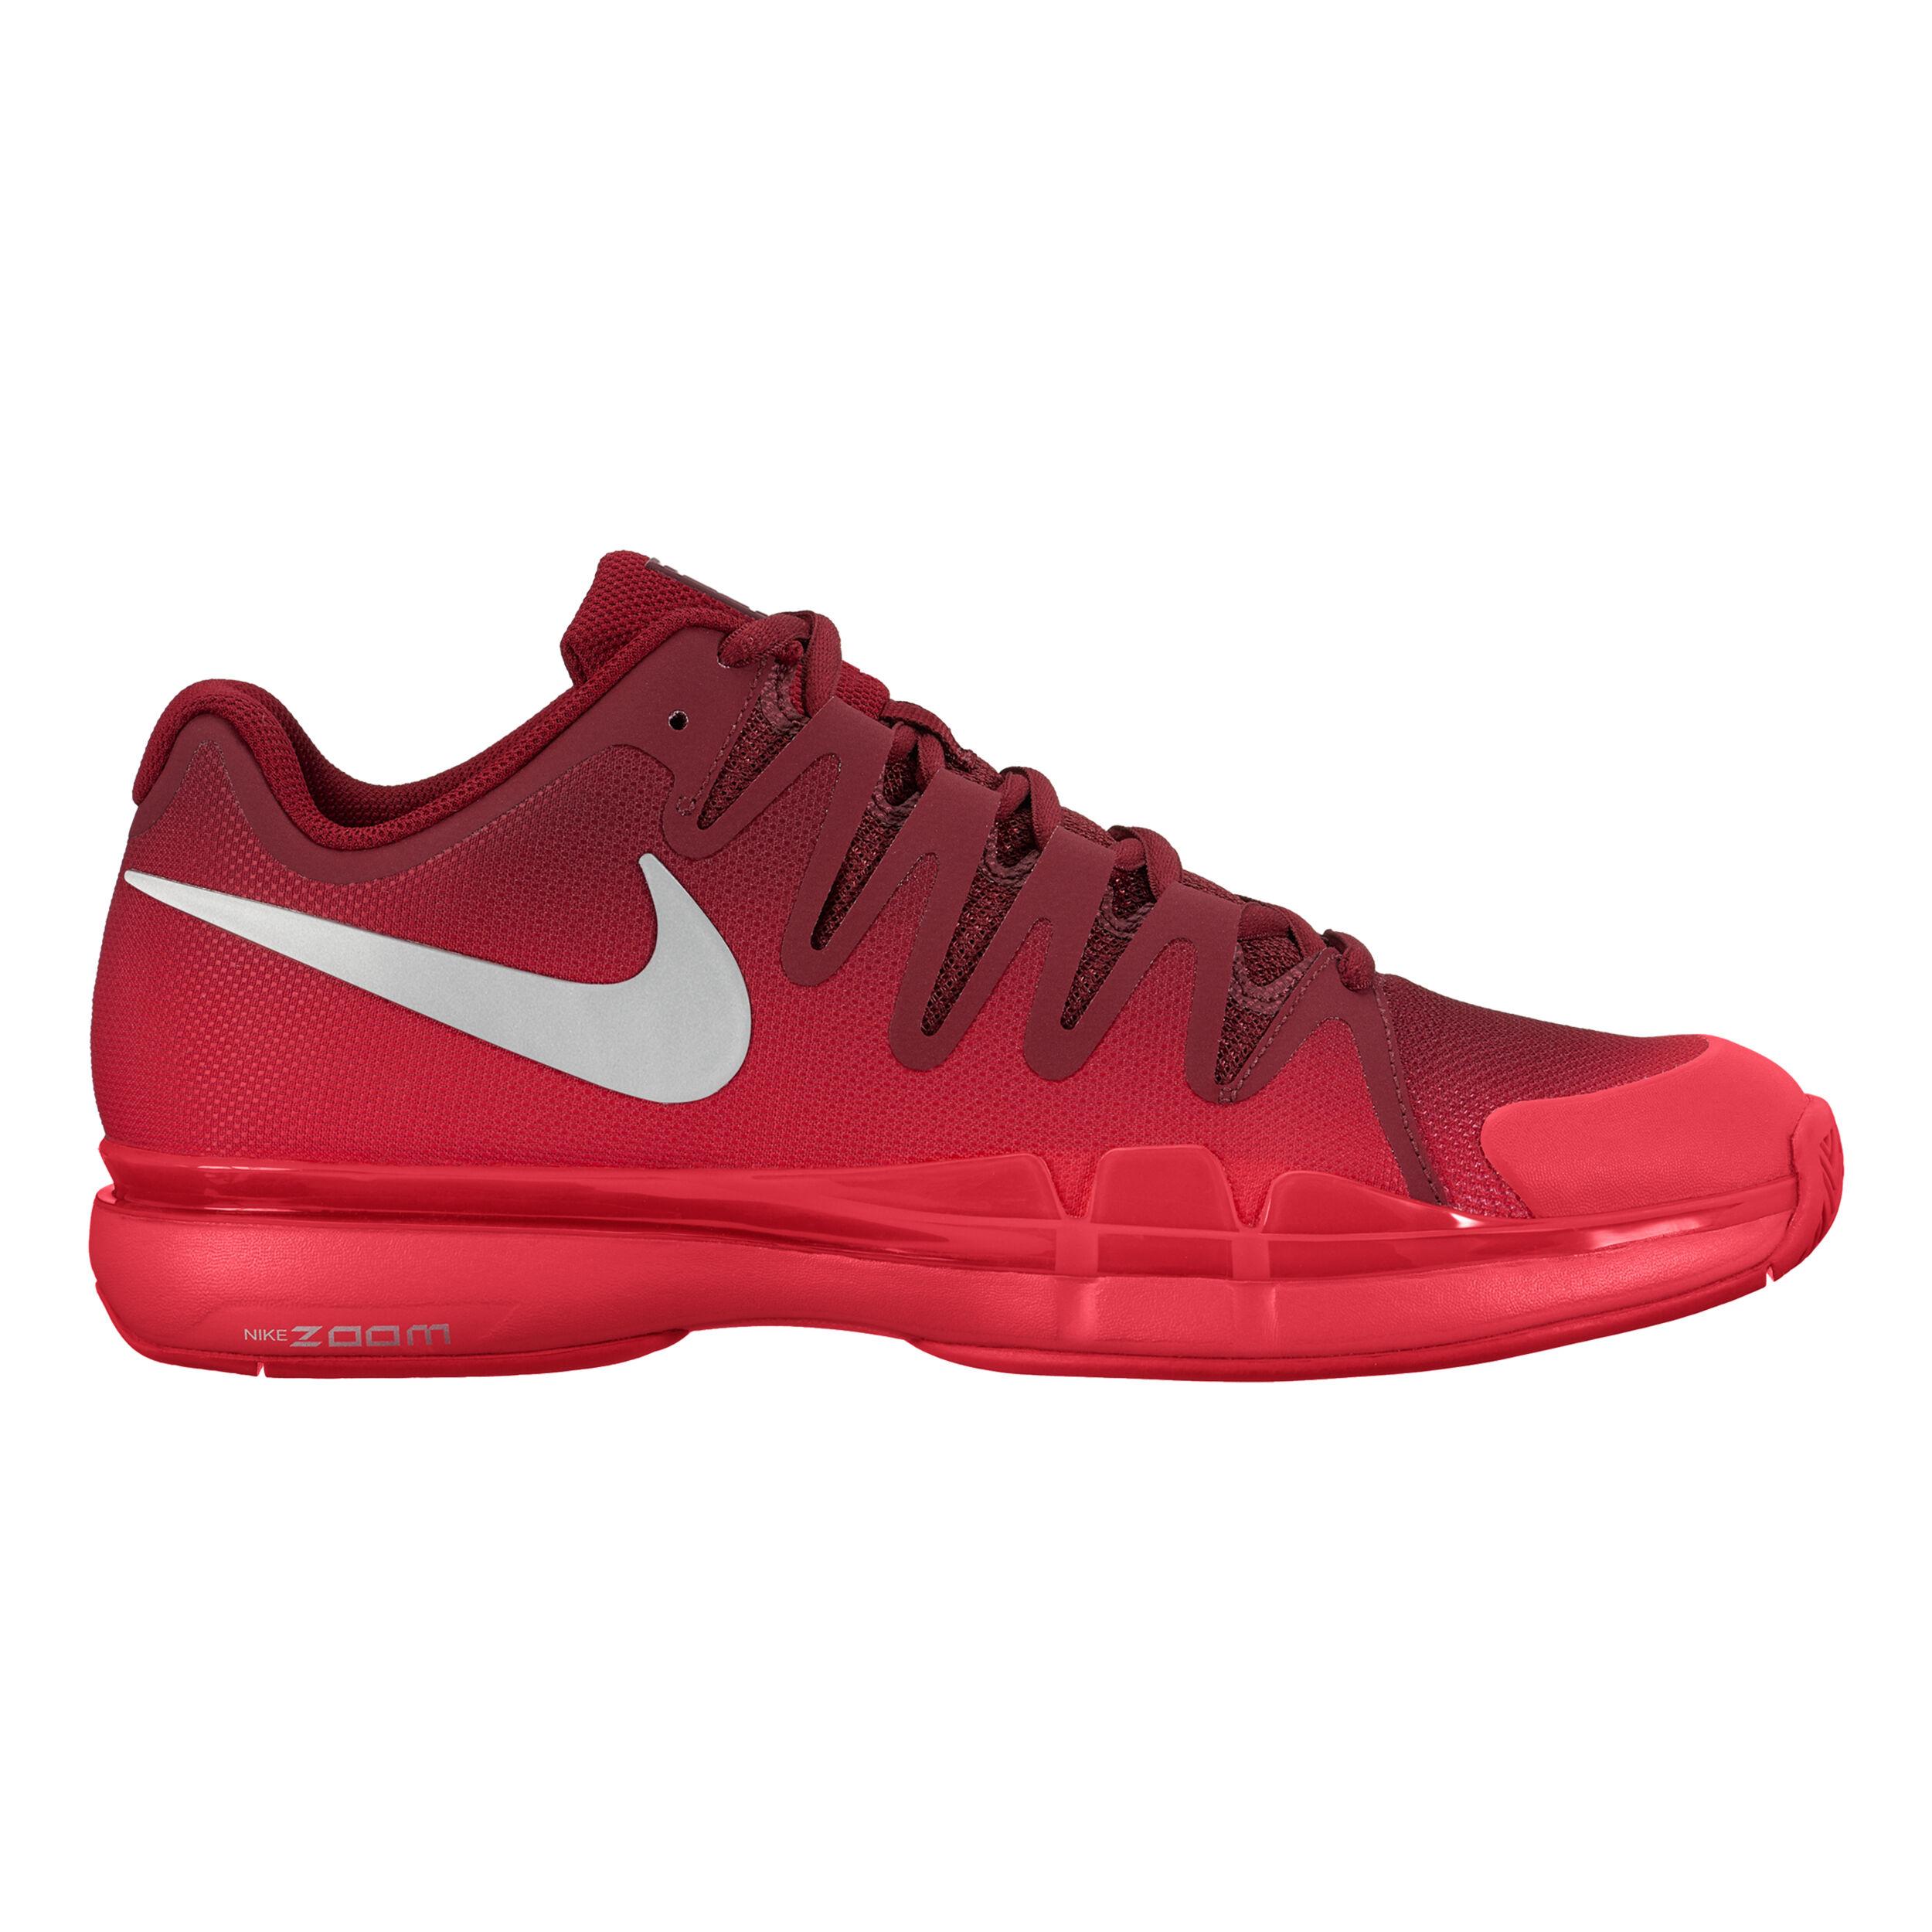 Nike Roger Federer Zoom Vapor 9.5 Tour Scarpa Per Tutte Le Superfici Uomini Rosso, Argento